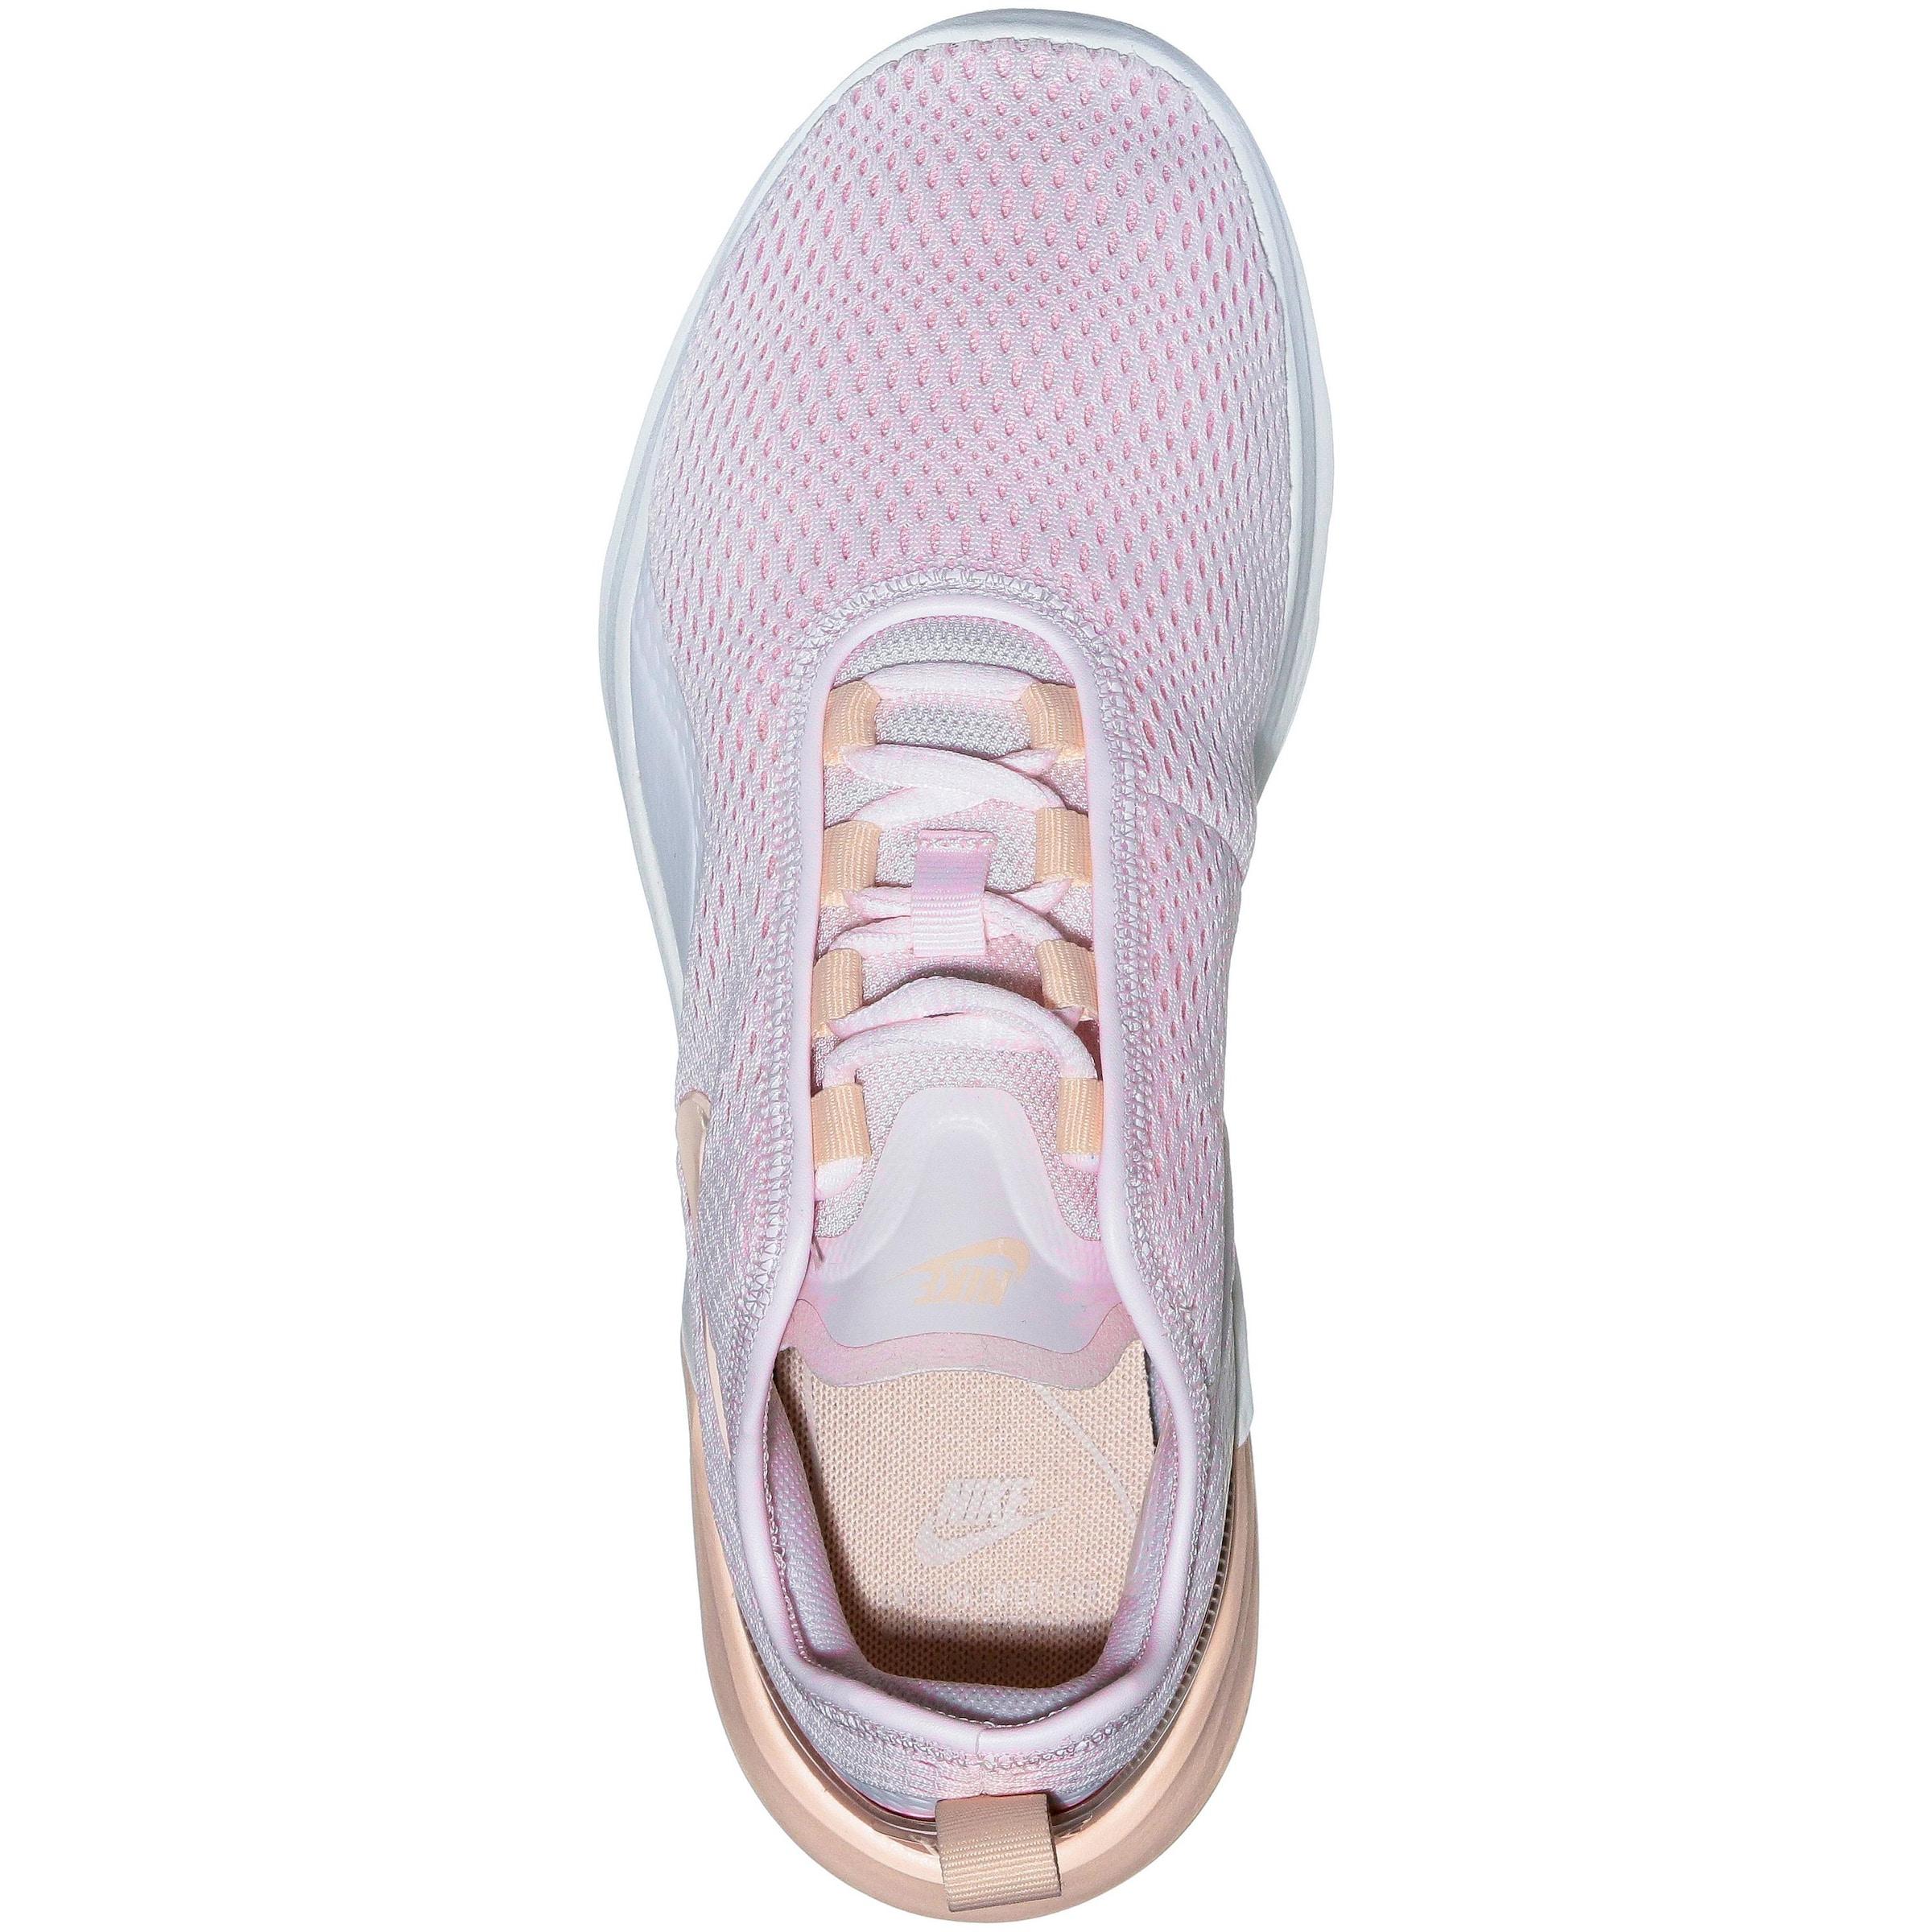 Sportswear Max Motion2' 'air Sneaker In PastellorangeWeiß Nike 4jLqA53cR